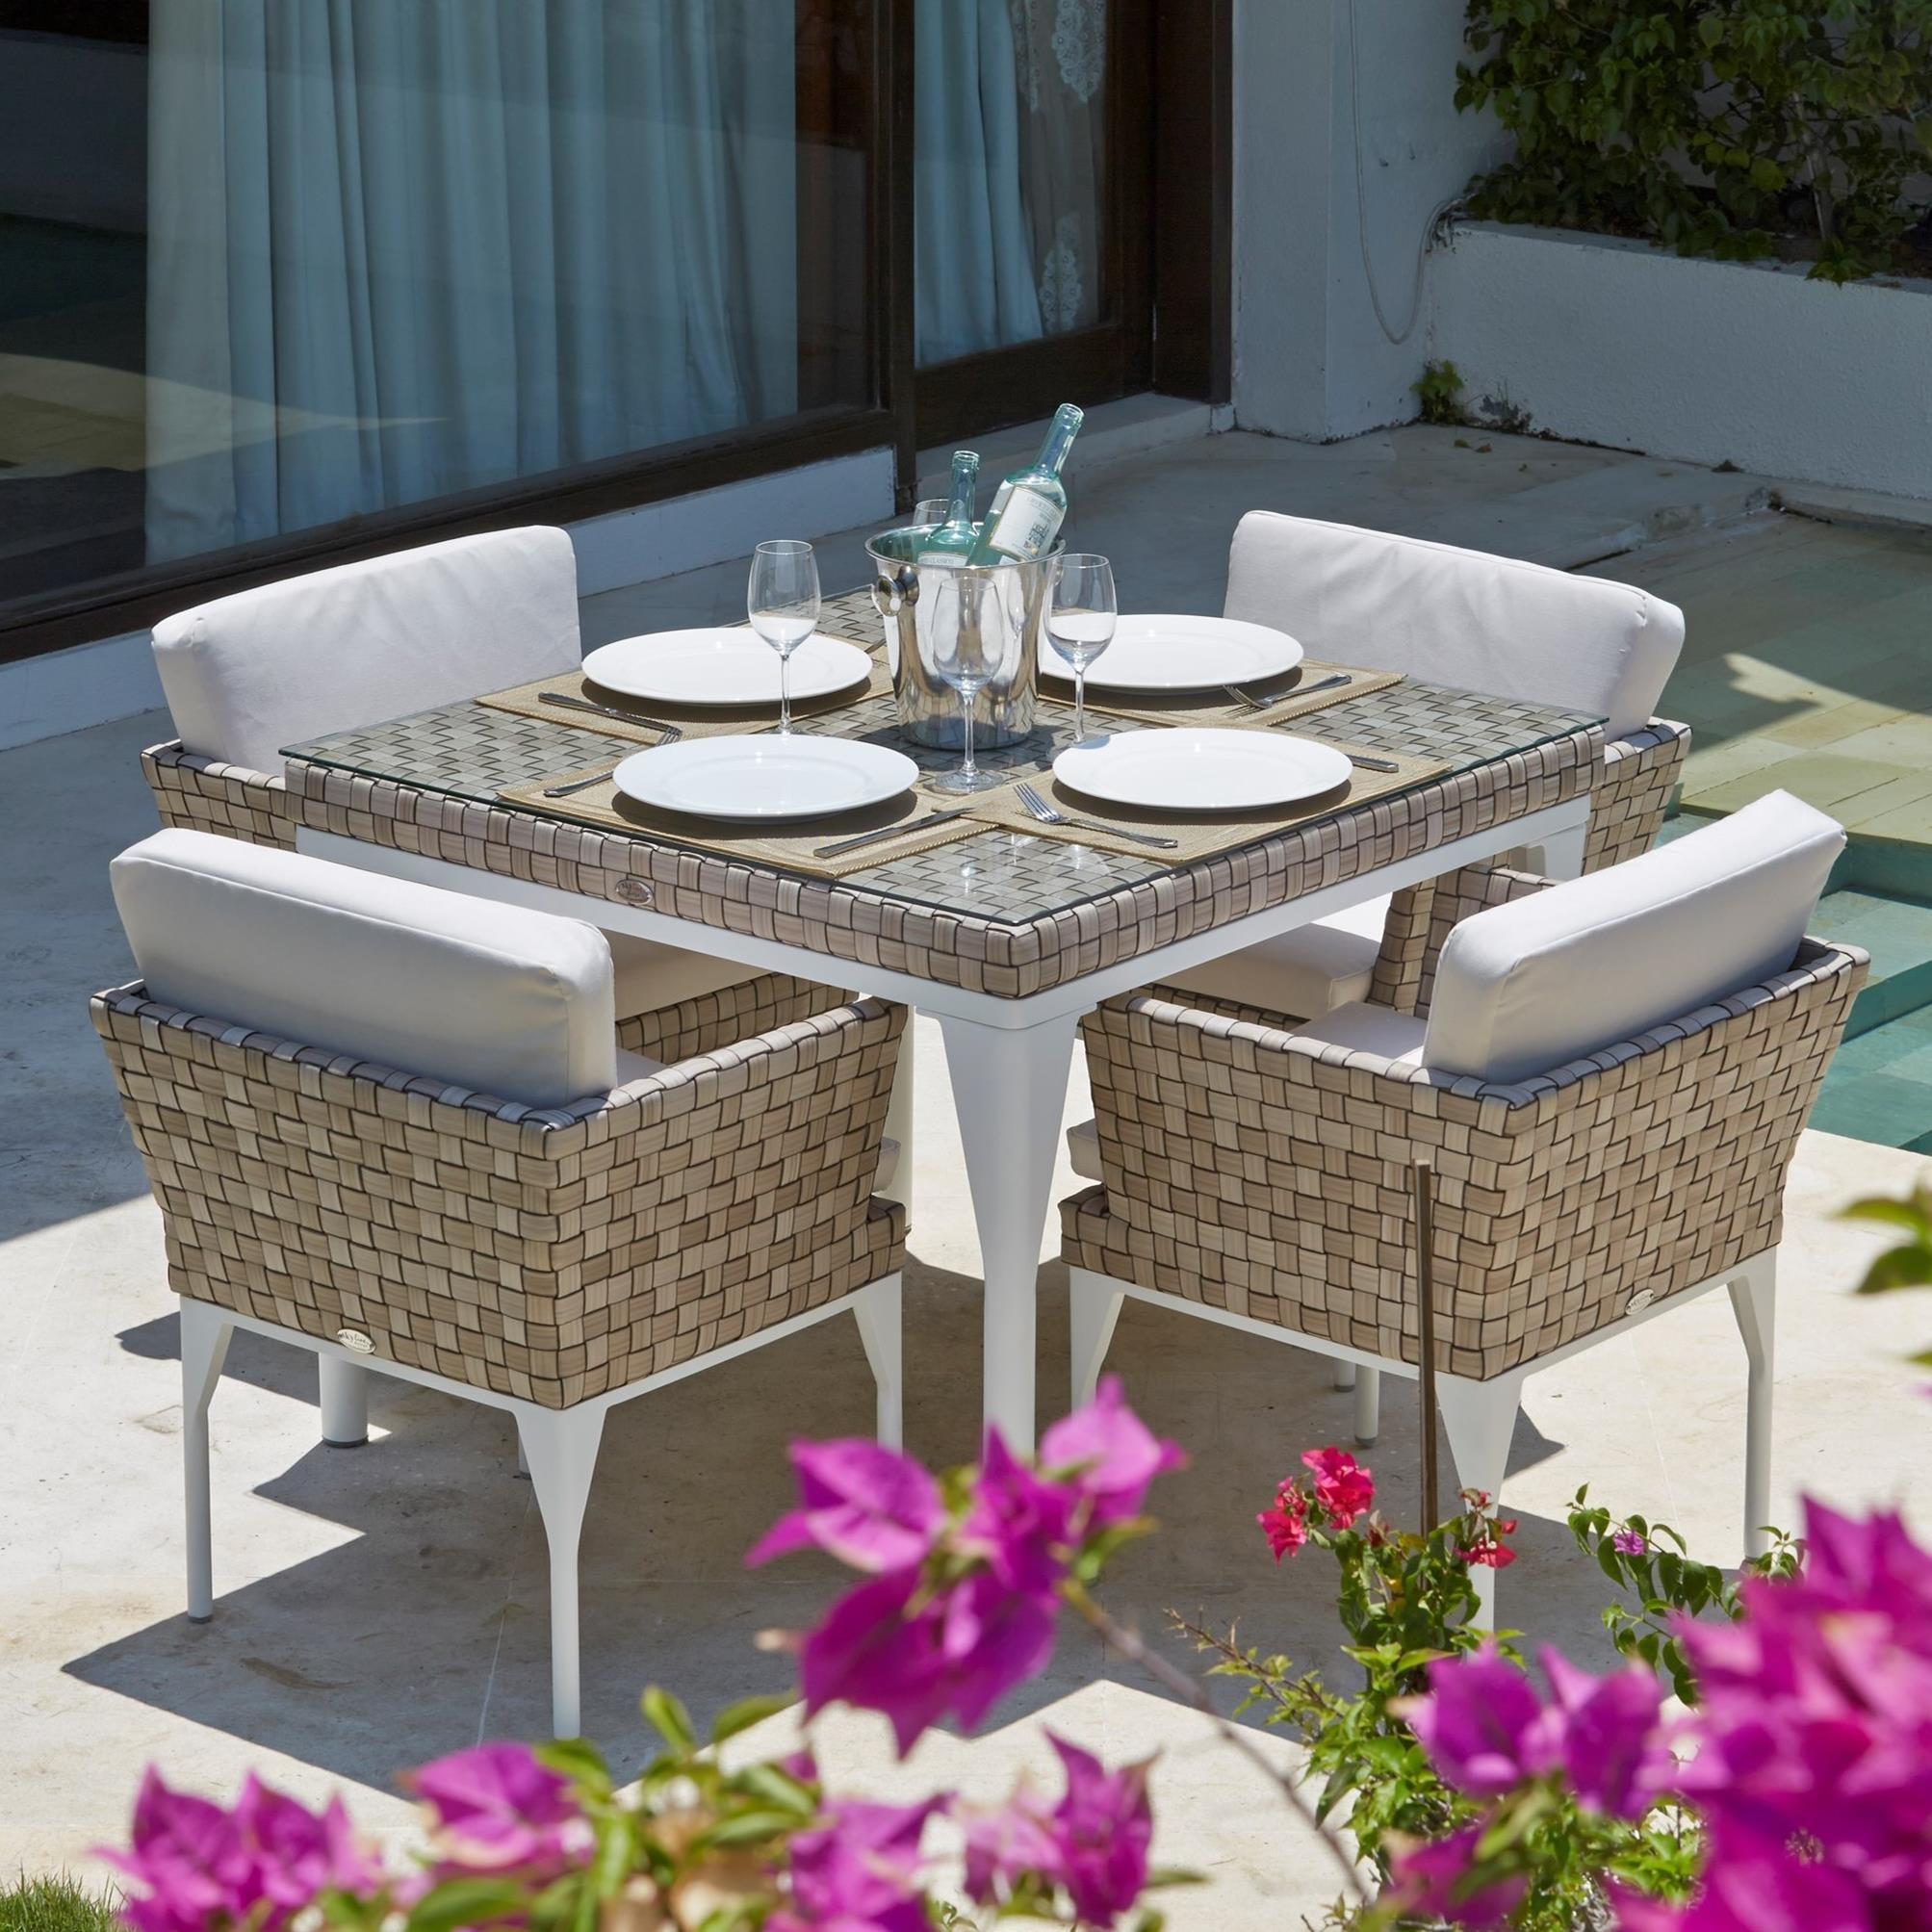 Skyline Design BRAFTA 5 Piece Outdoor Dining Set